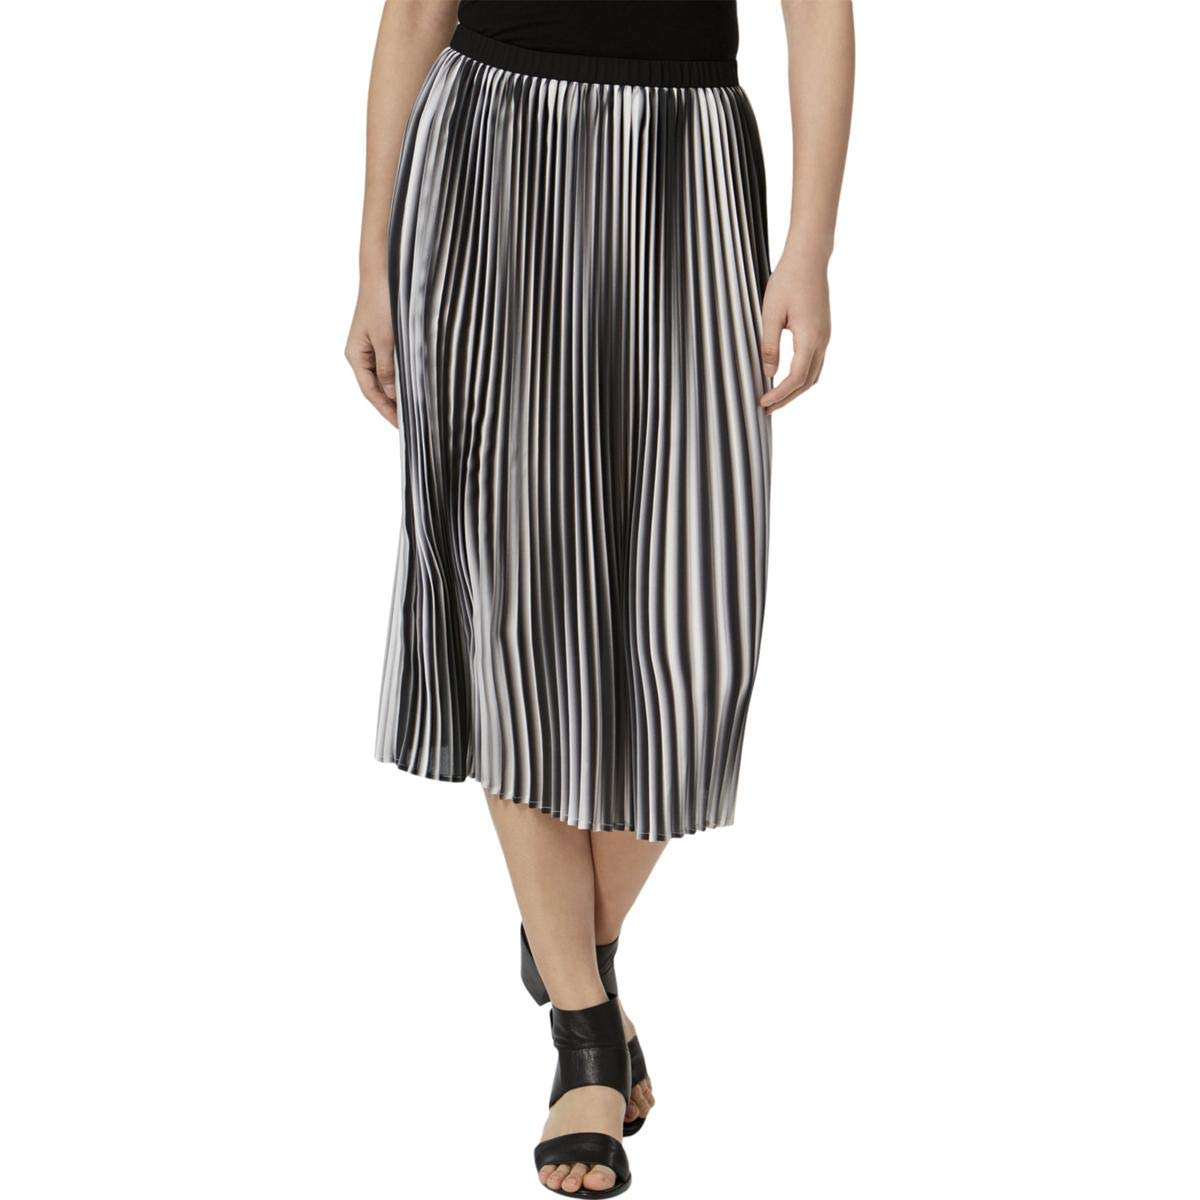 Black White EileenFisher Womens Pleated Striped Midi Skirt